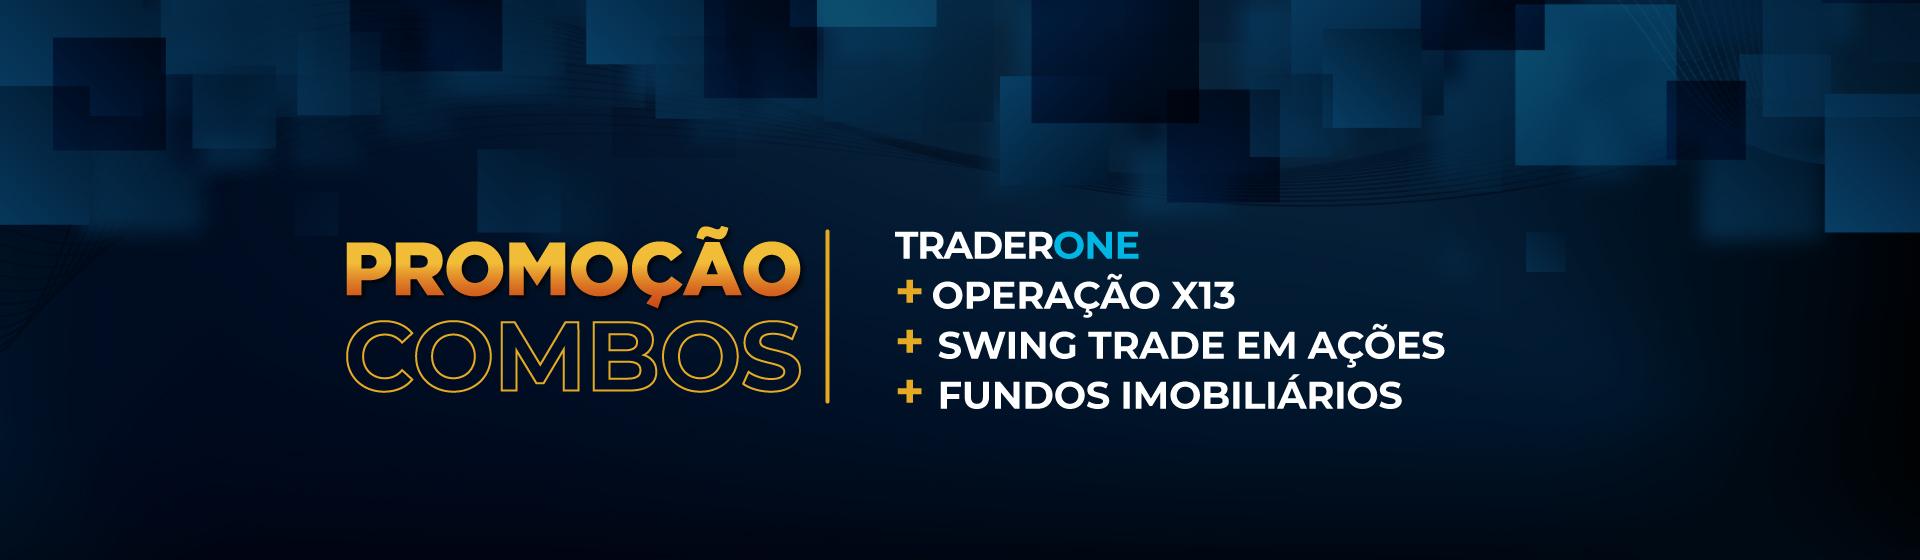 1 banner trader%2bx13%2bswing%2bfi